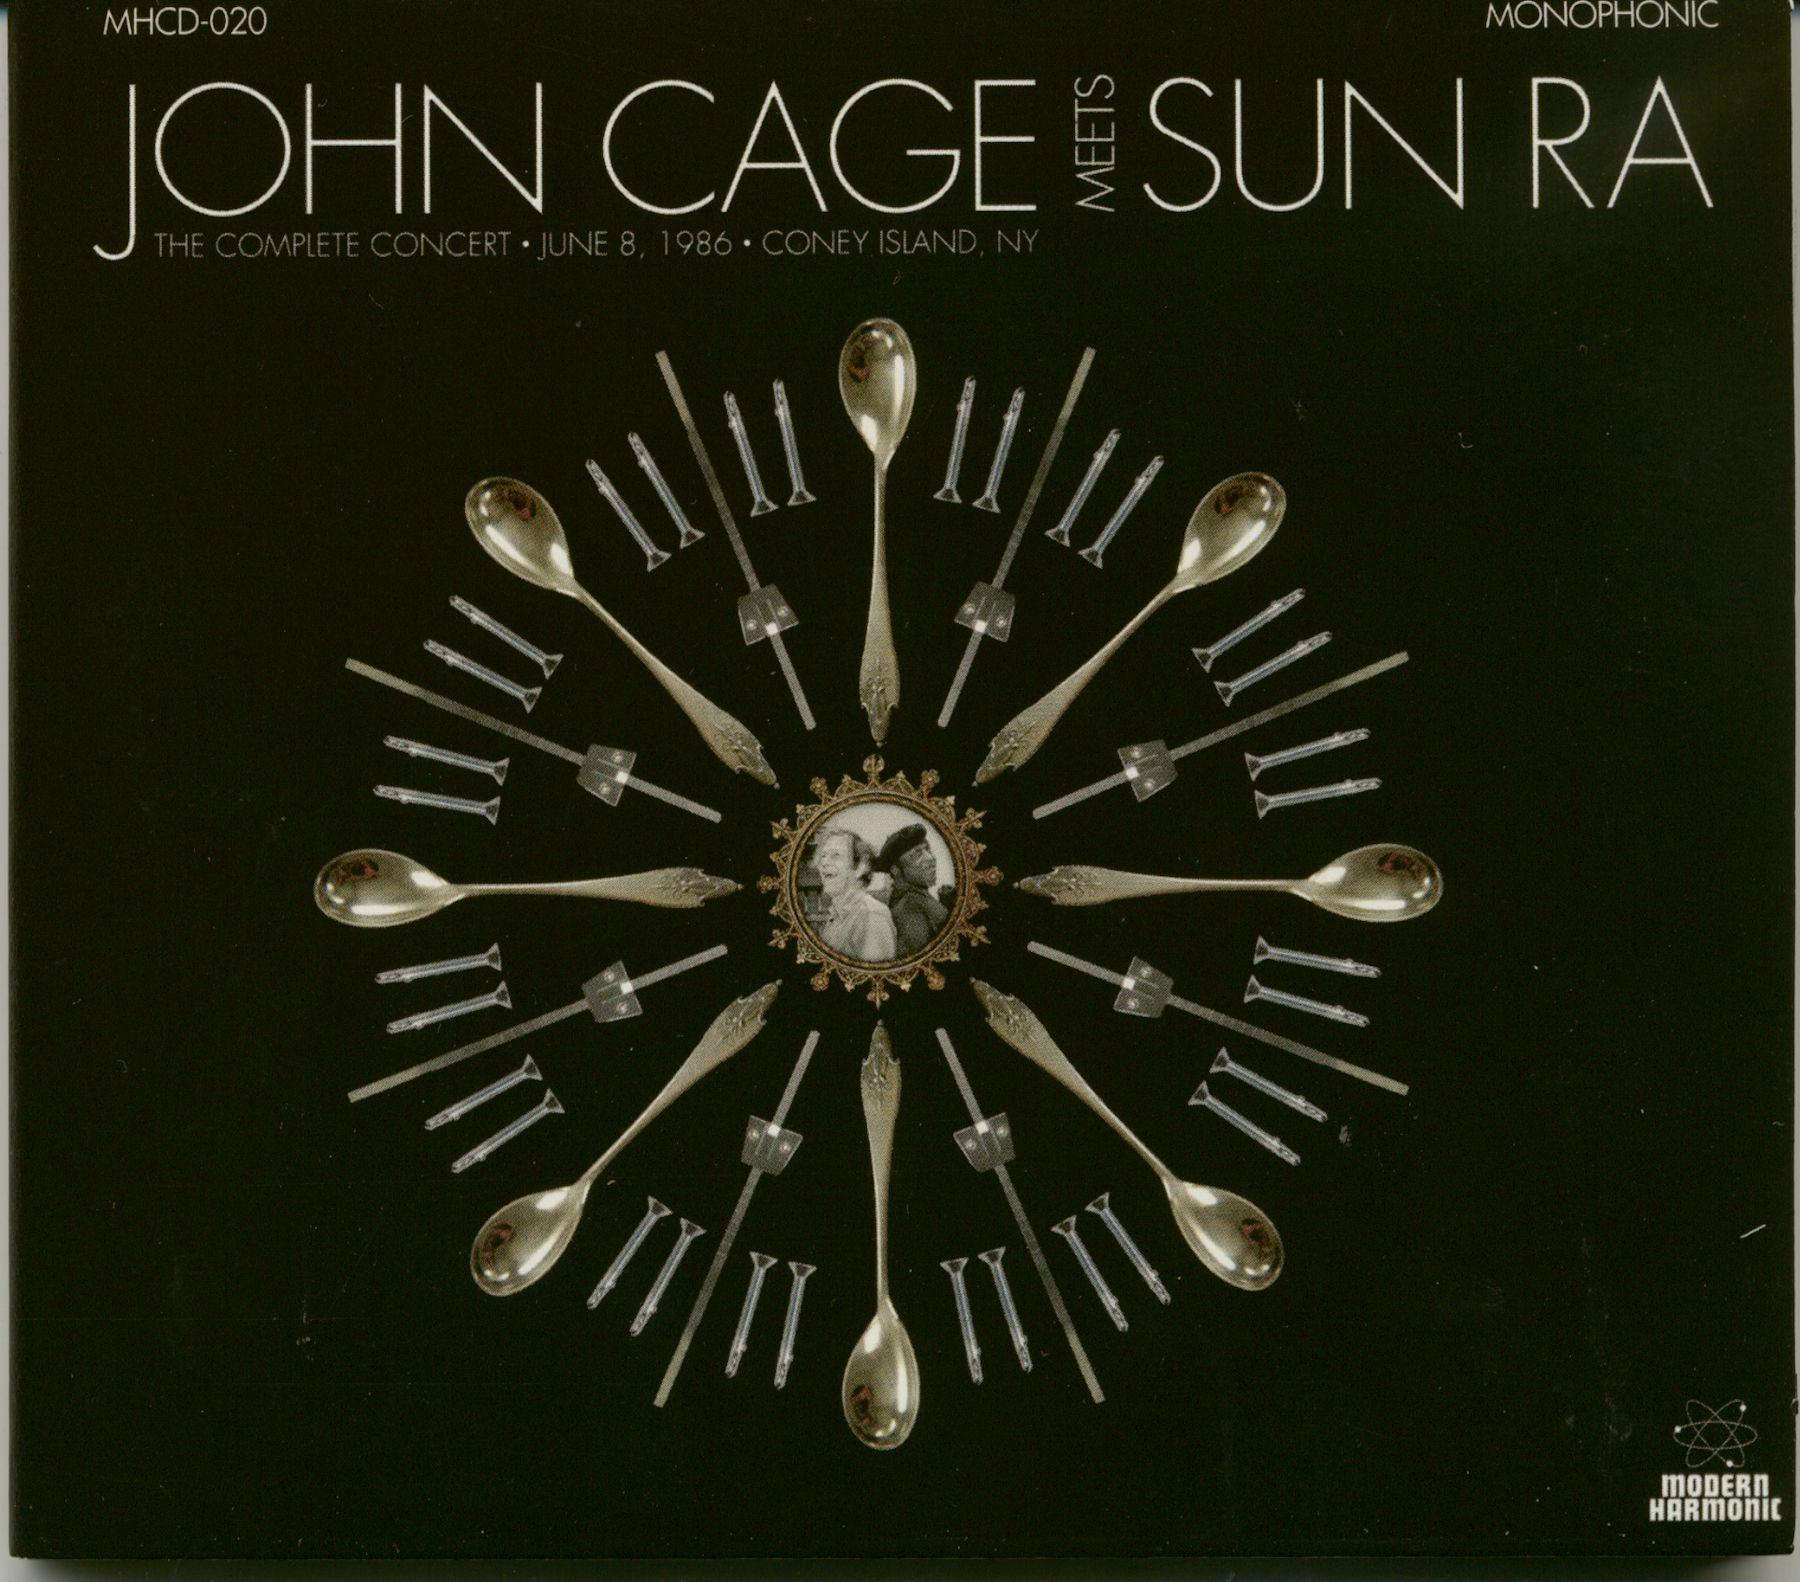 John Cage & Sun Ra CD : The Complete Concert (CD) - Bear Family Records